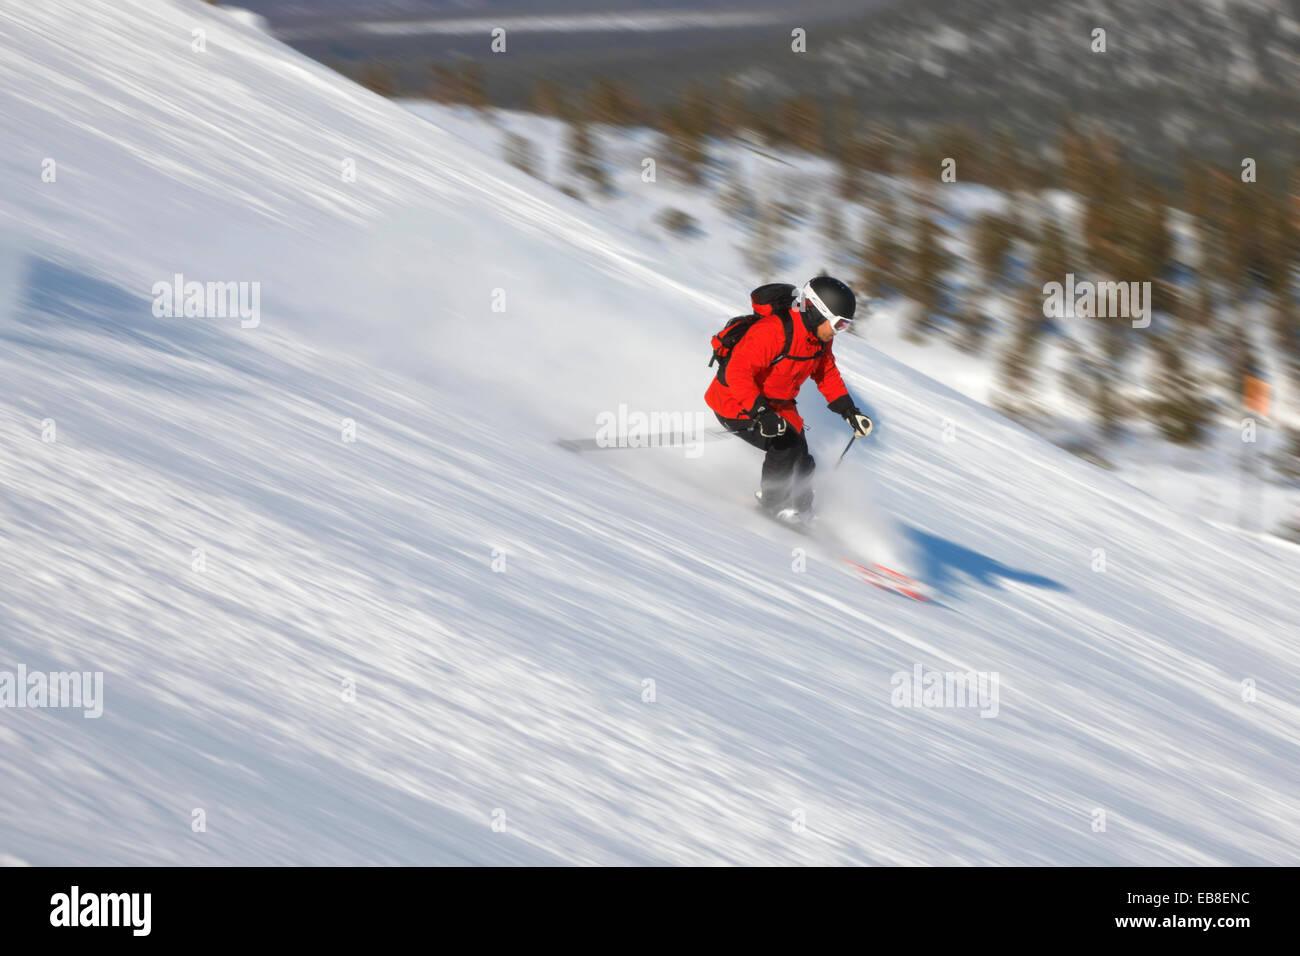 Skier downhill, winter Lapland - Stock Image